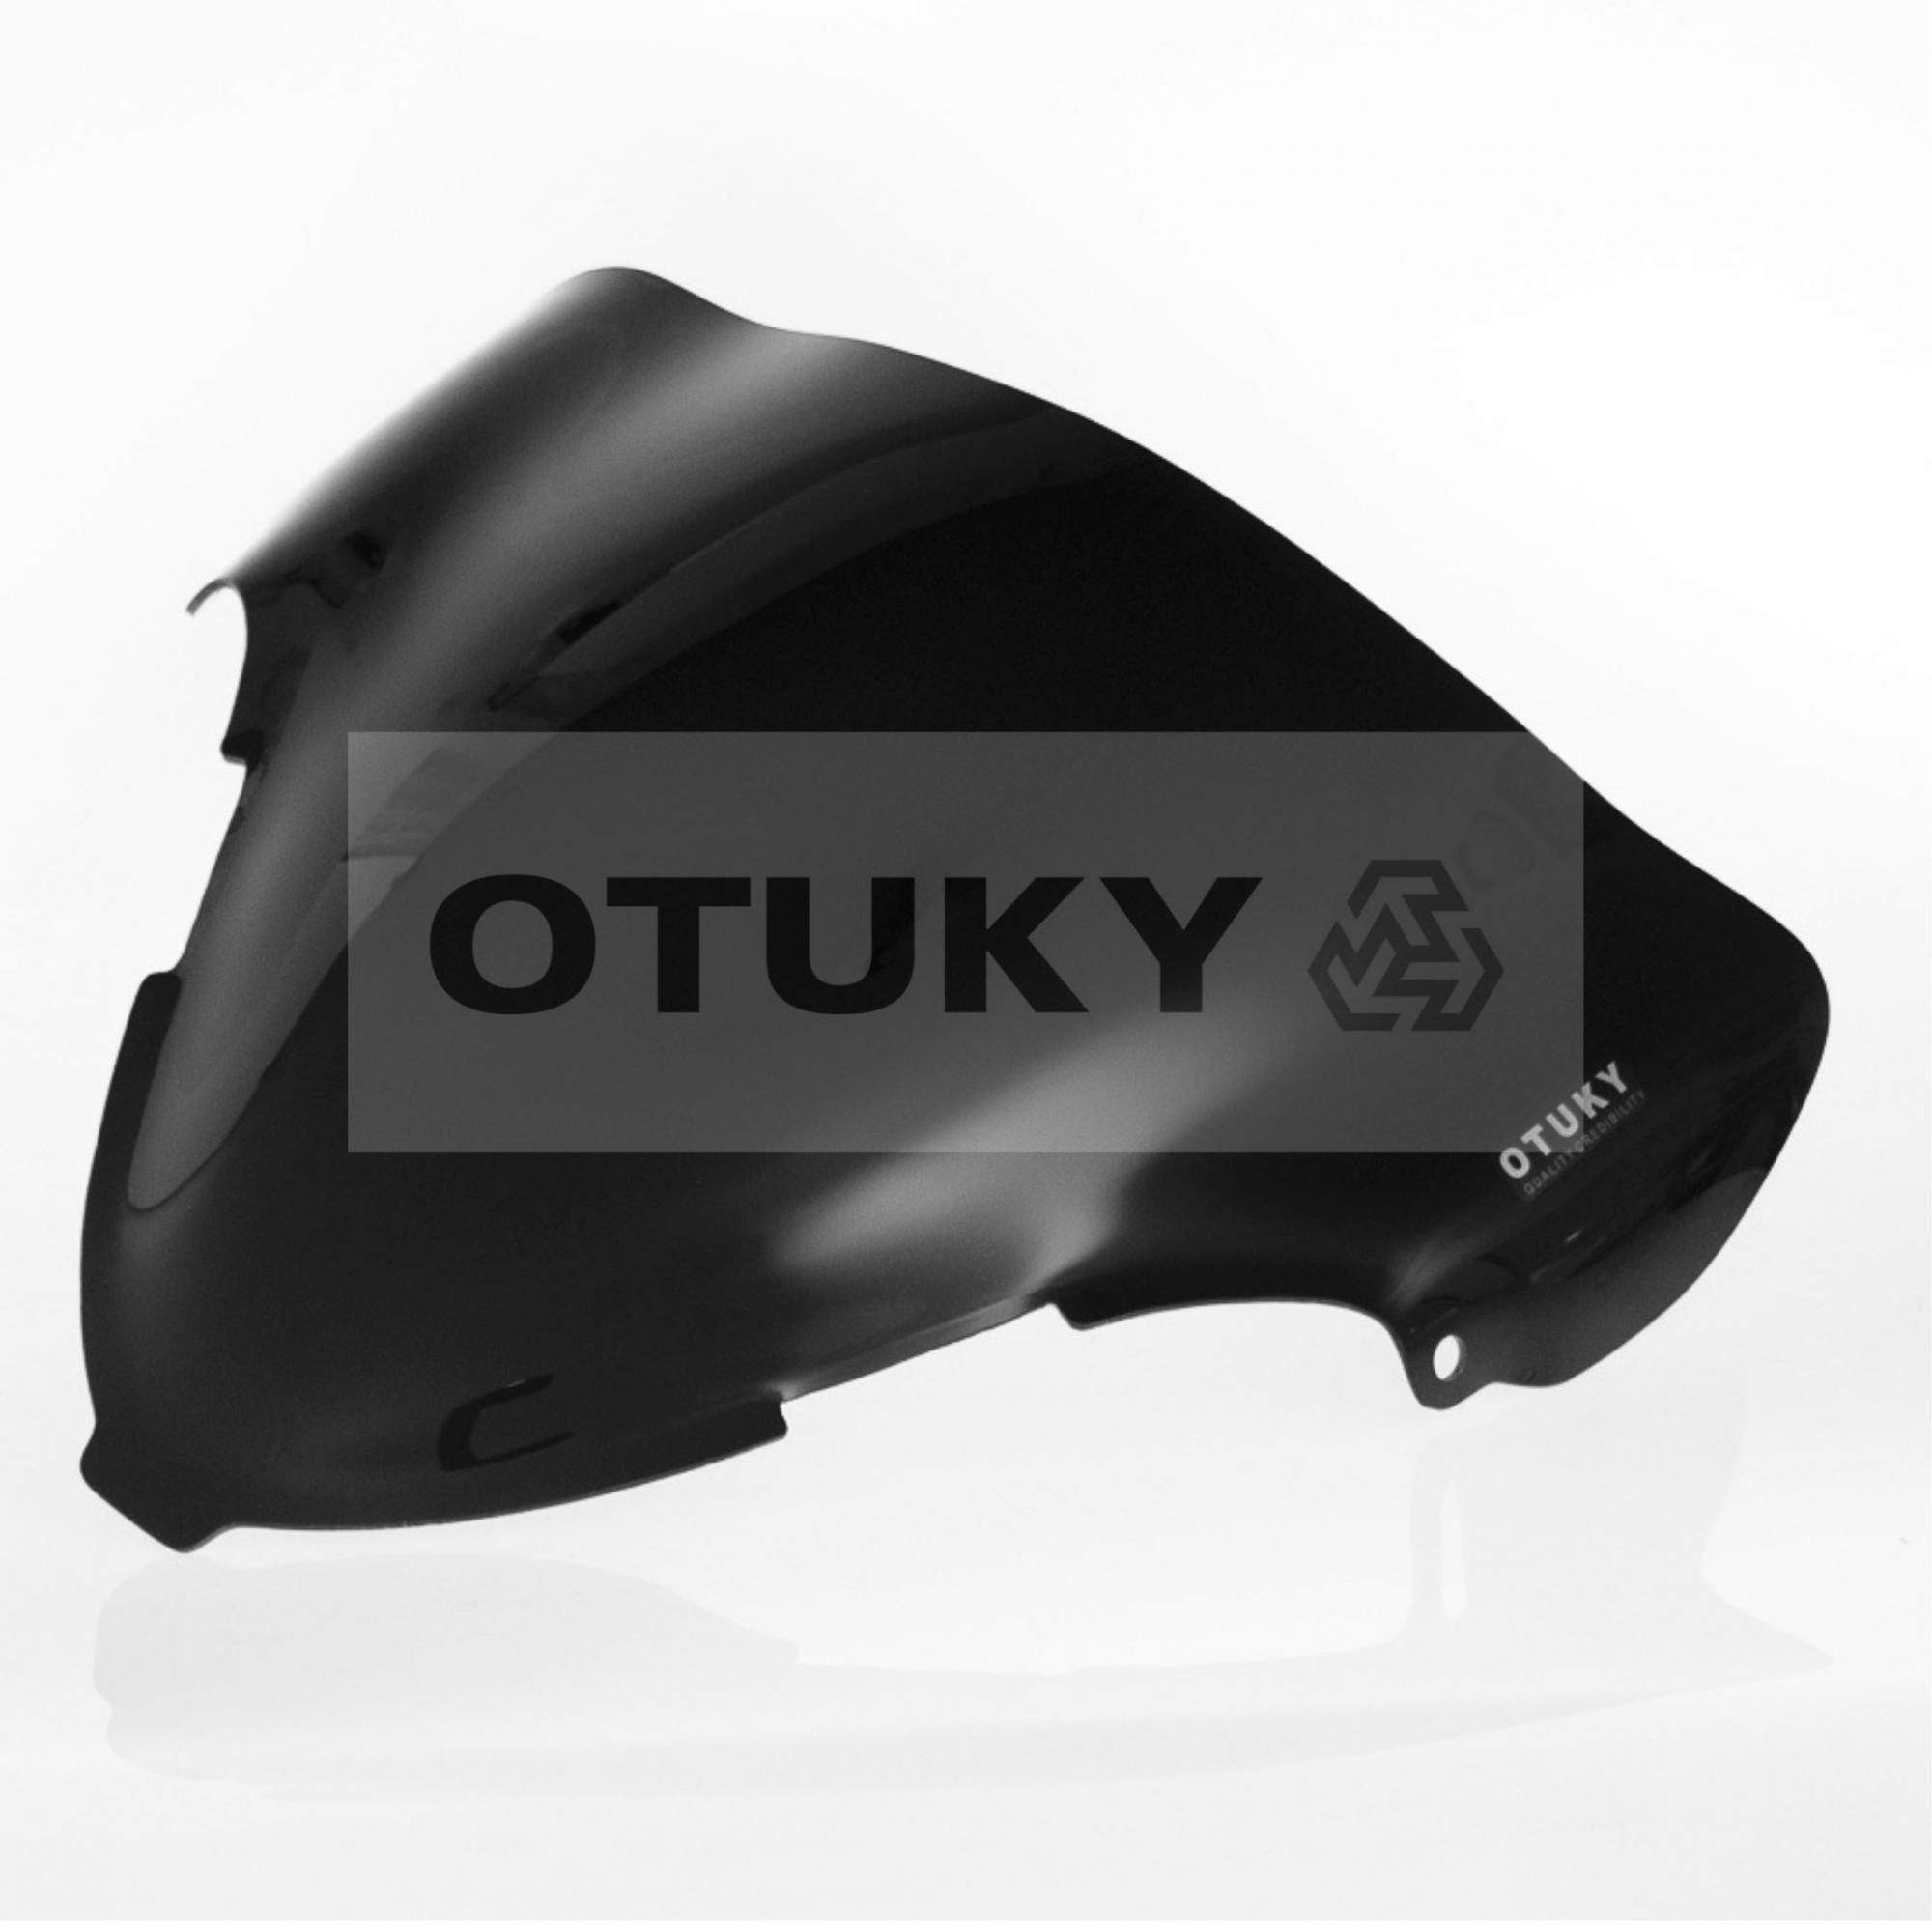 Bolha para Moto GSX 1300 R Hayabusa 1999 2000 2001 2002 2003 2004 2005 2006 2007 Otuky Preto